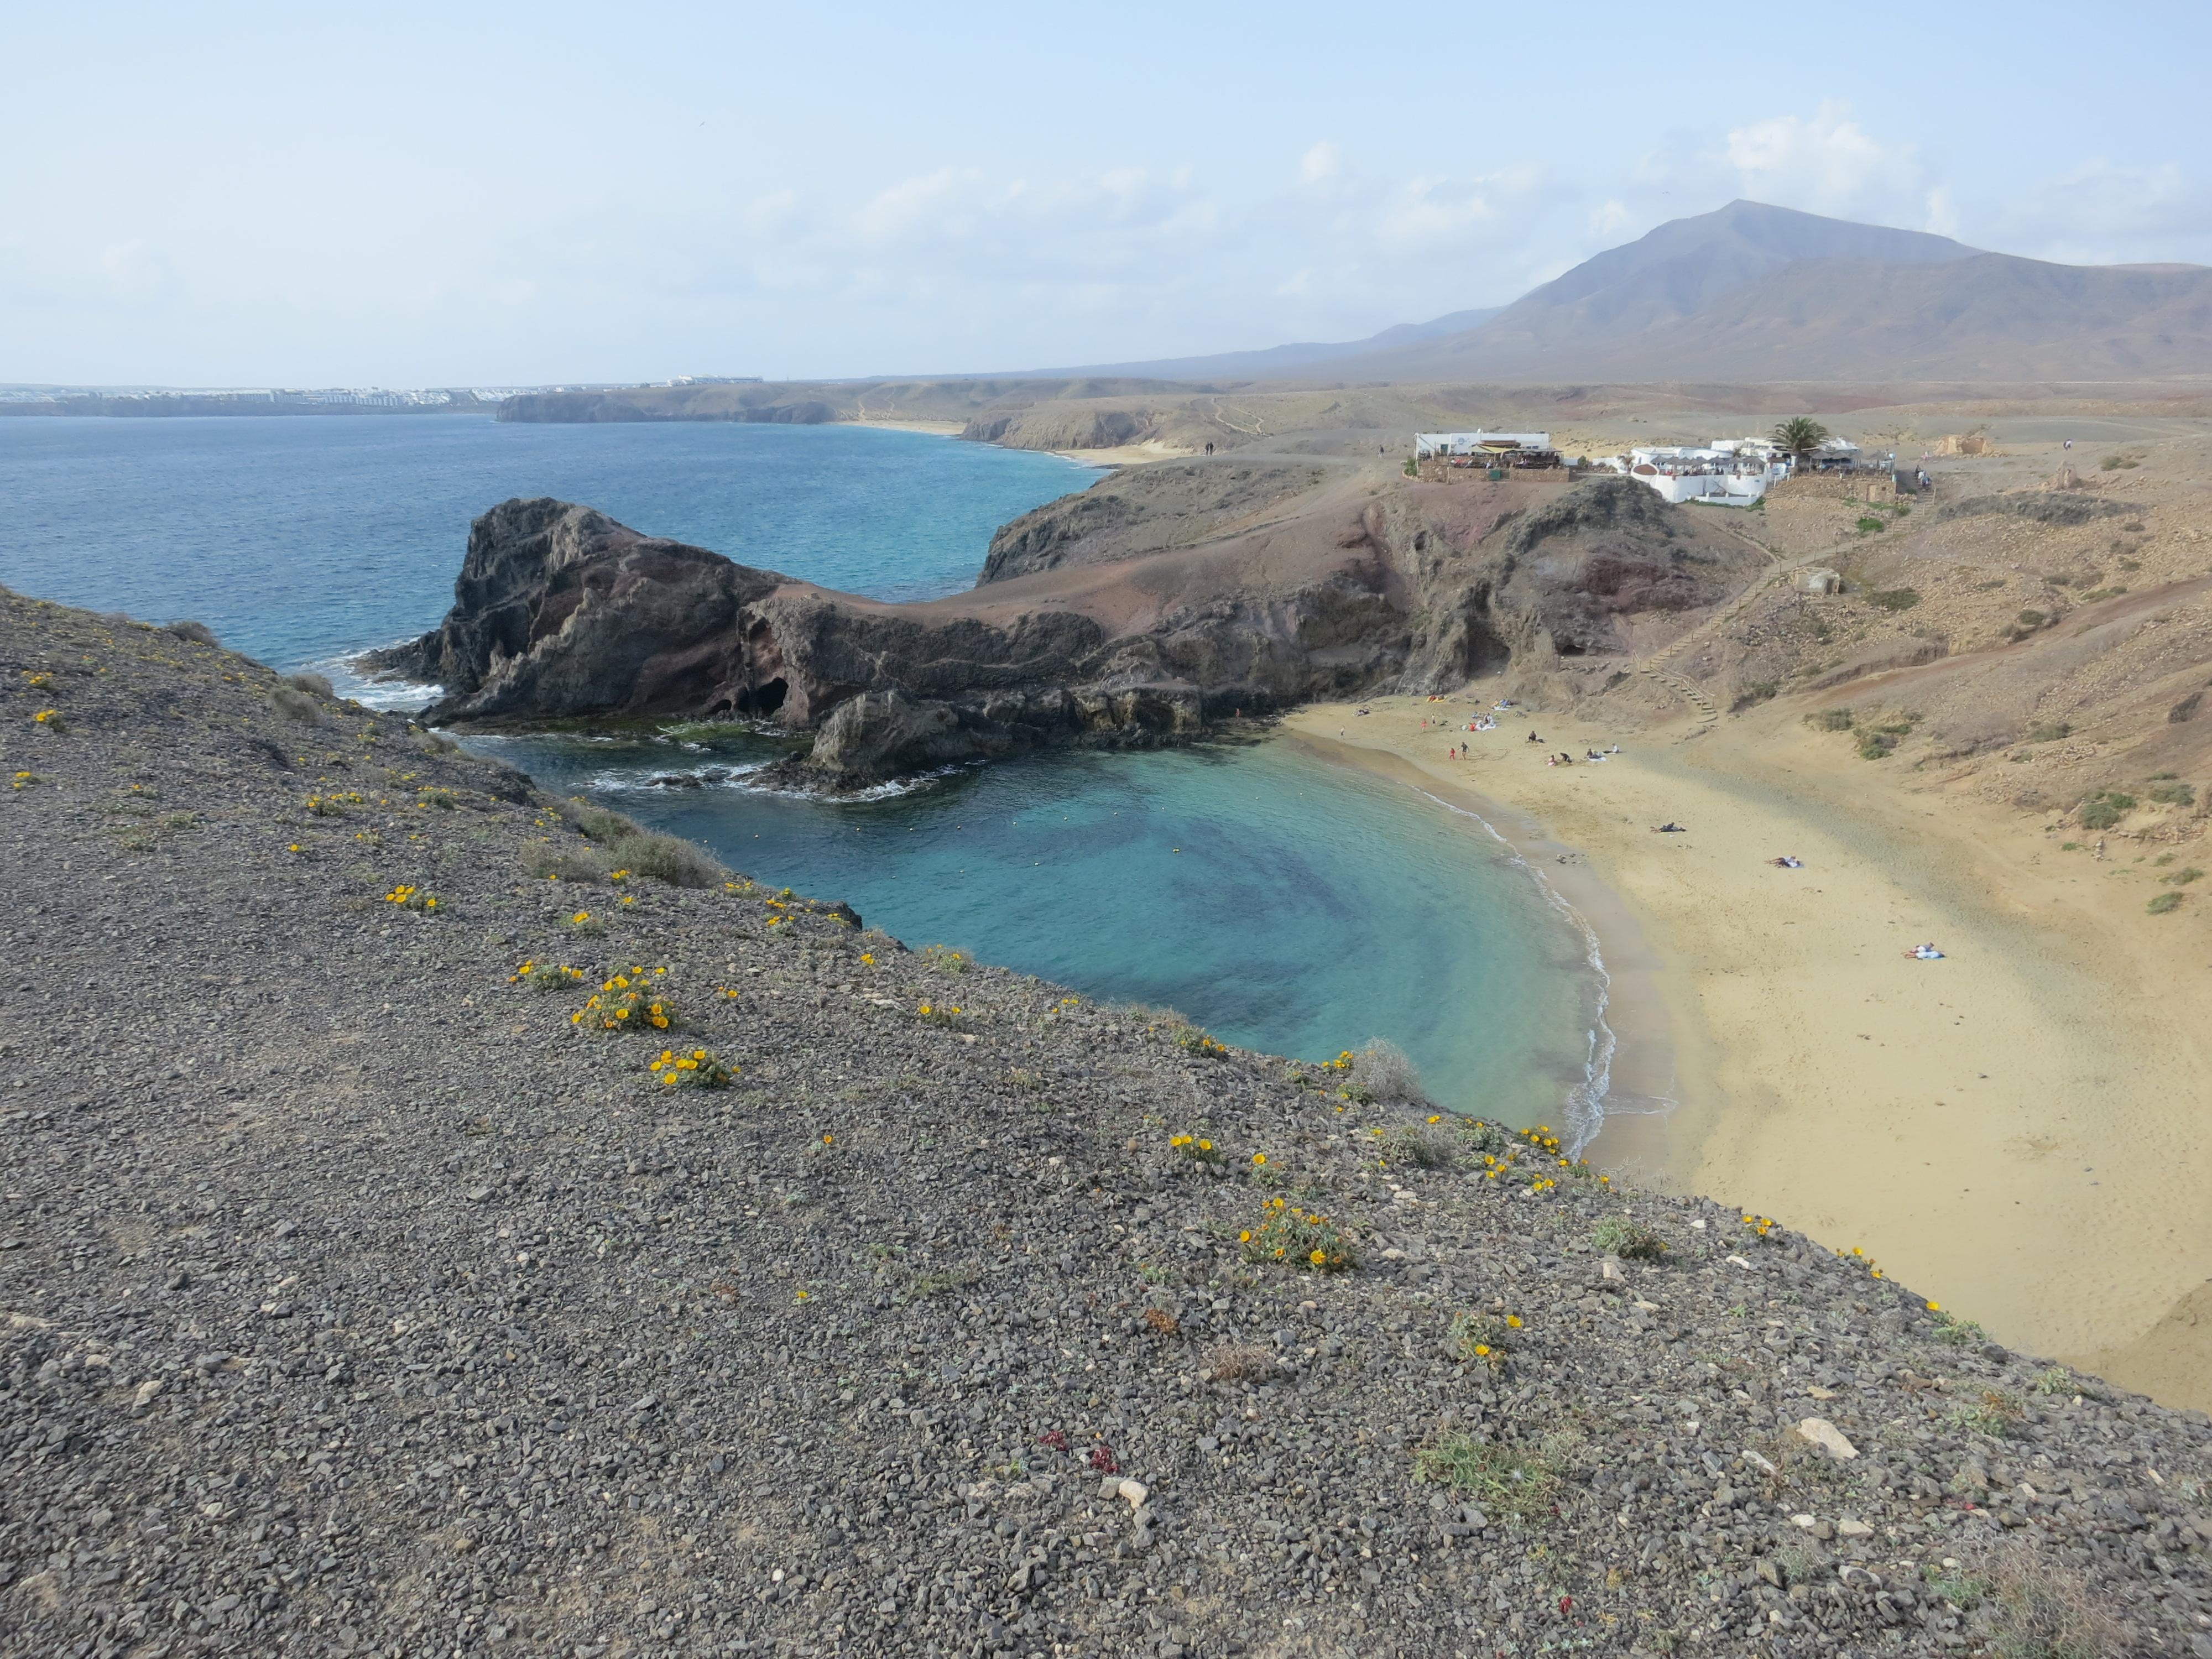 Playa de Papagayos.